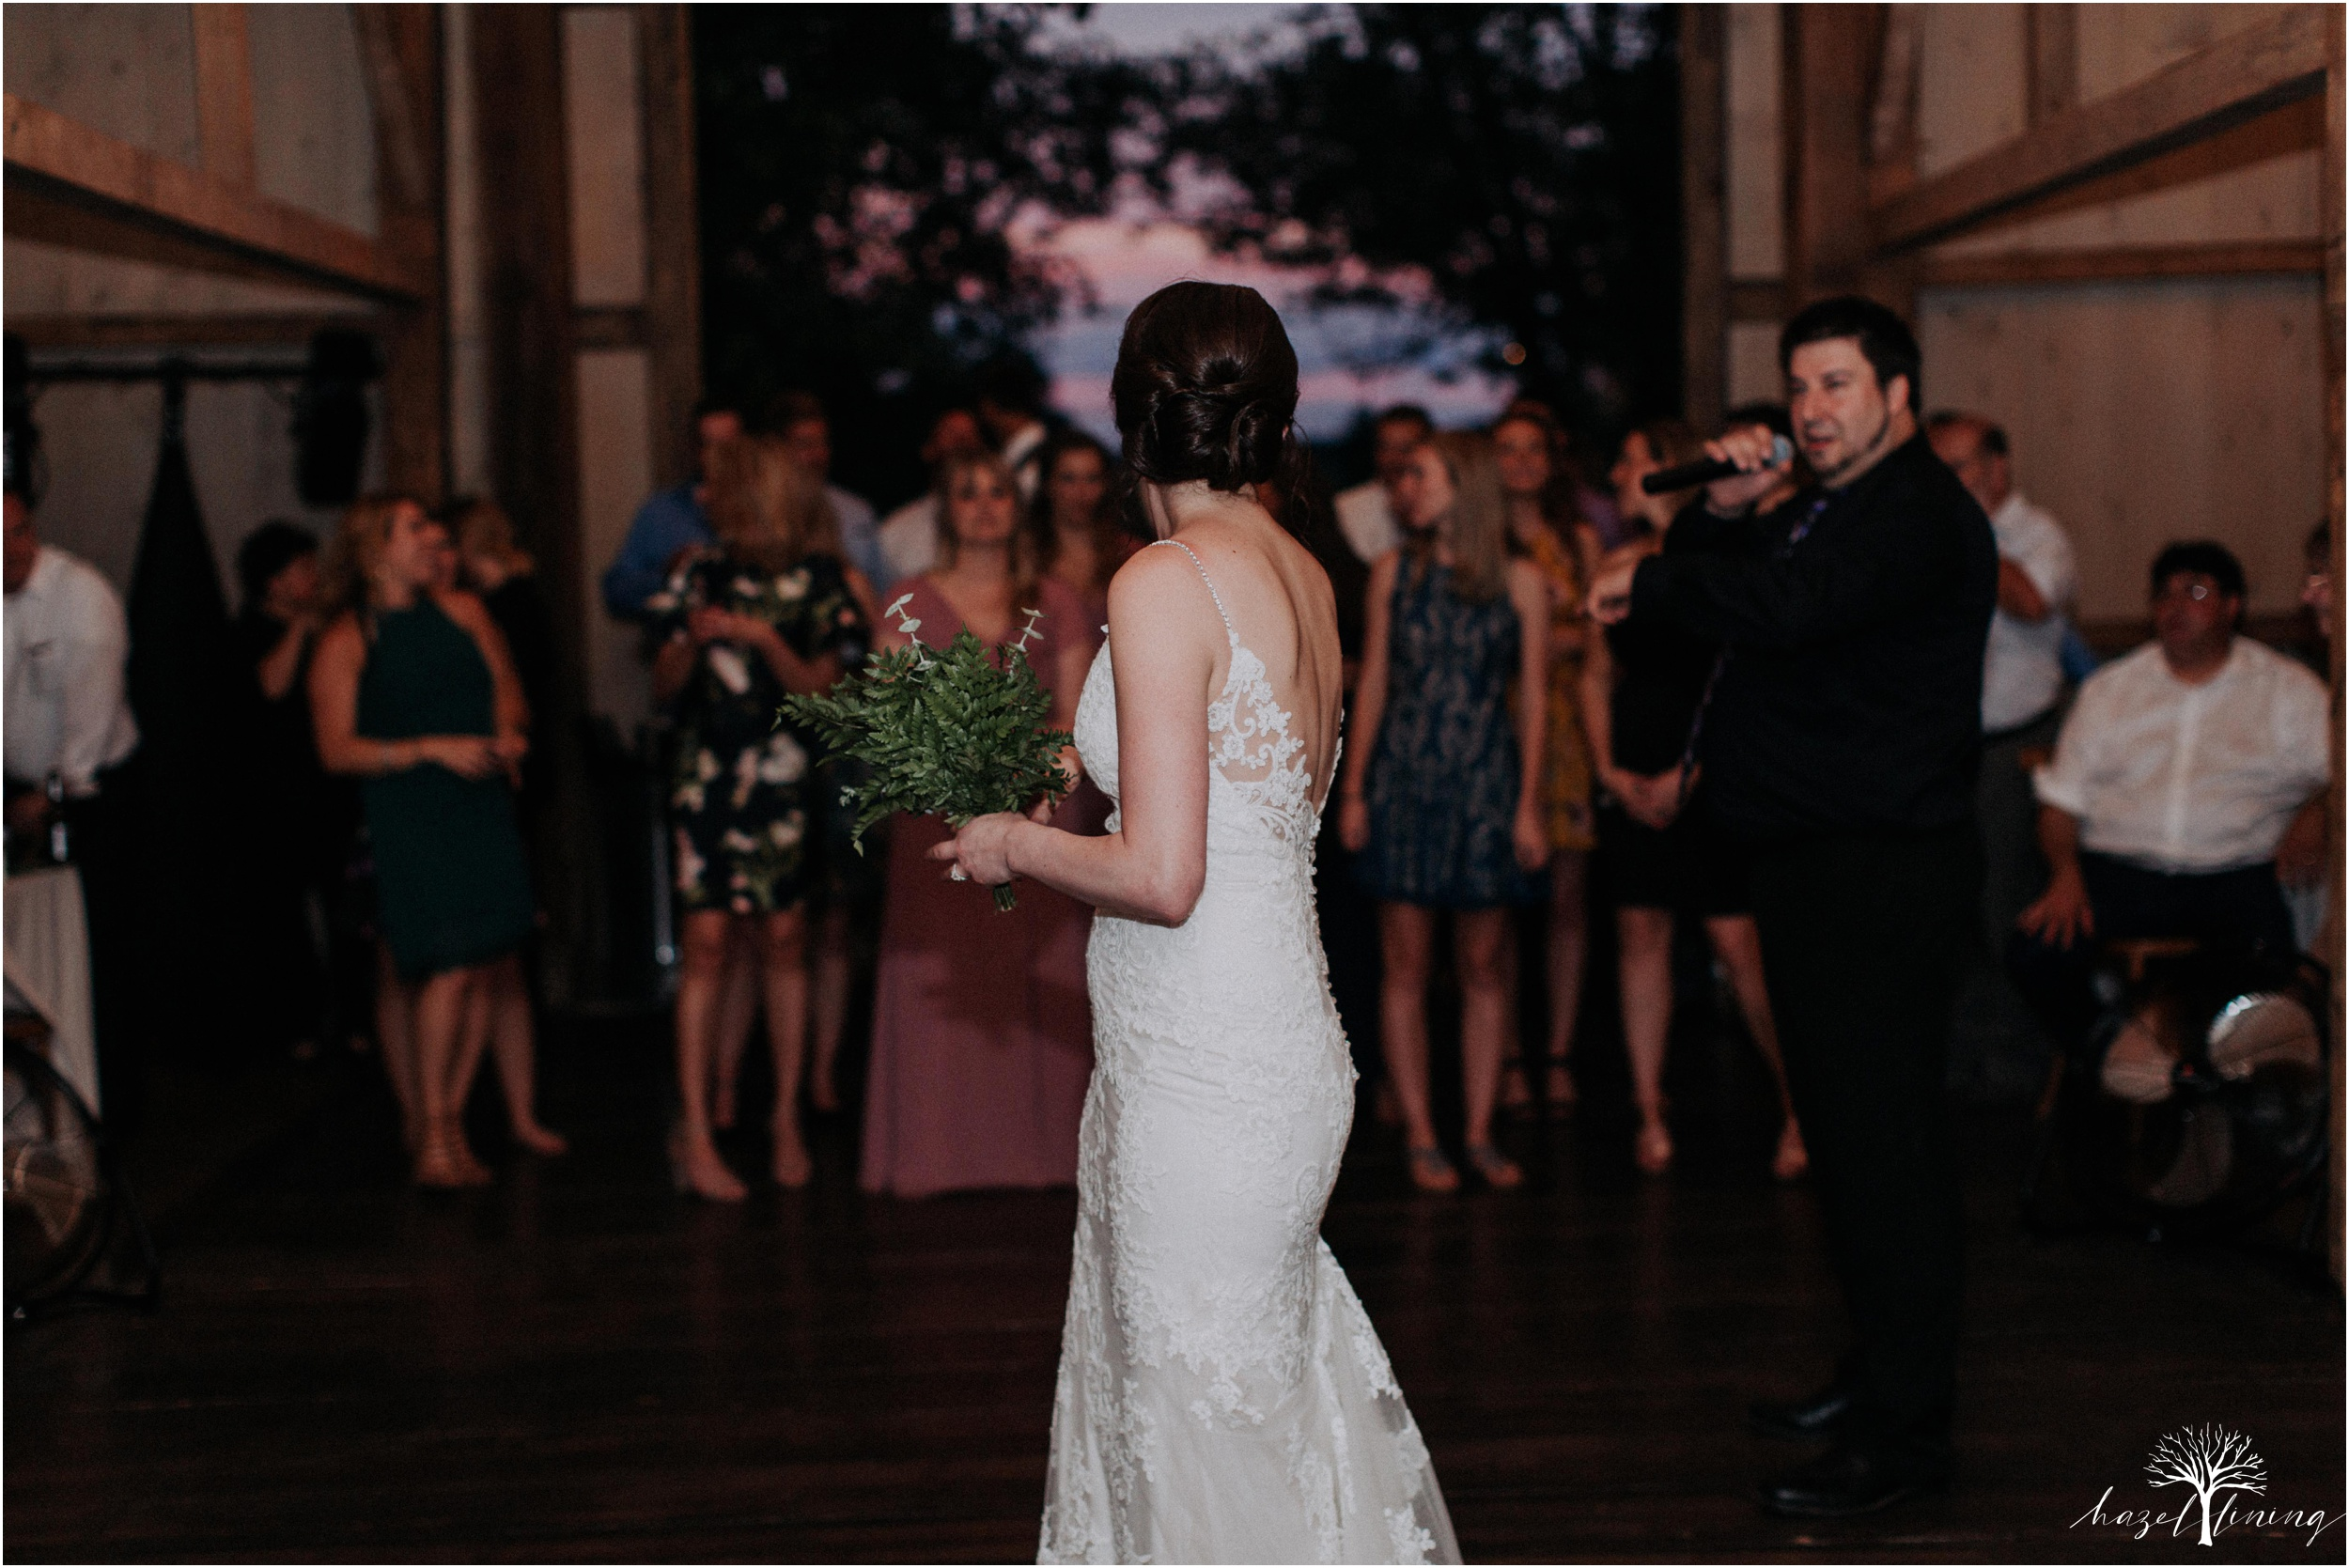 hazel-lining-travel-wedding-elopement-photography-lisa-landon-shoemaker-the-farm-bakery-and-events-bucks-county-quakertown-pennsylvania-summer-country-outdoor-farm-wedding_0162.jpg